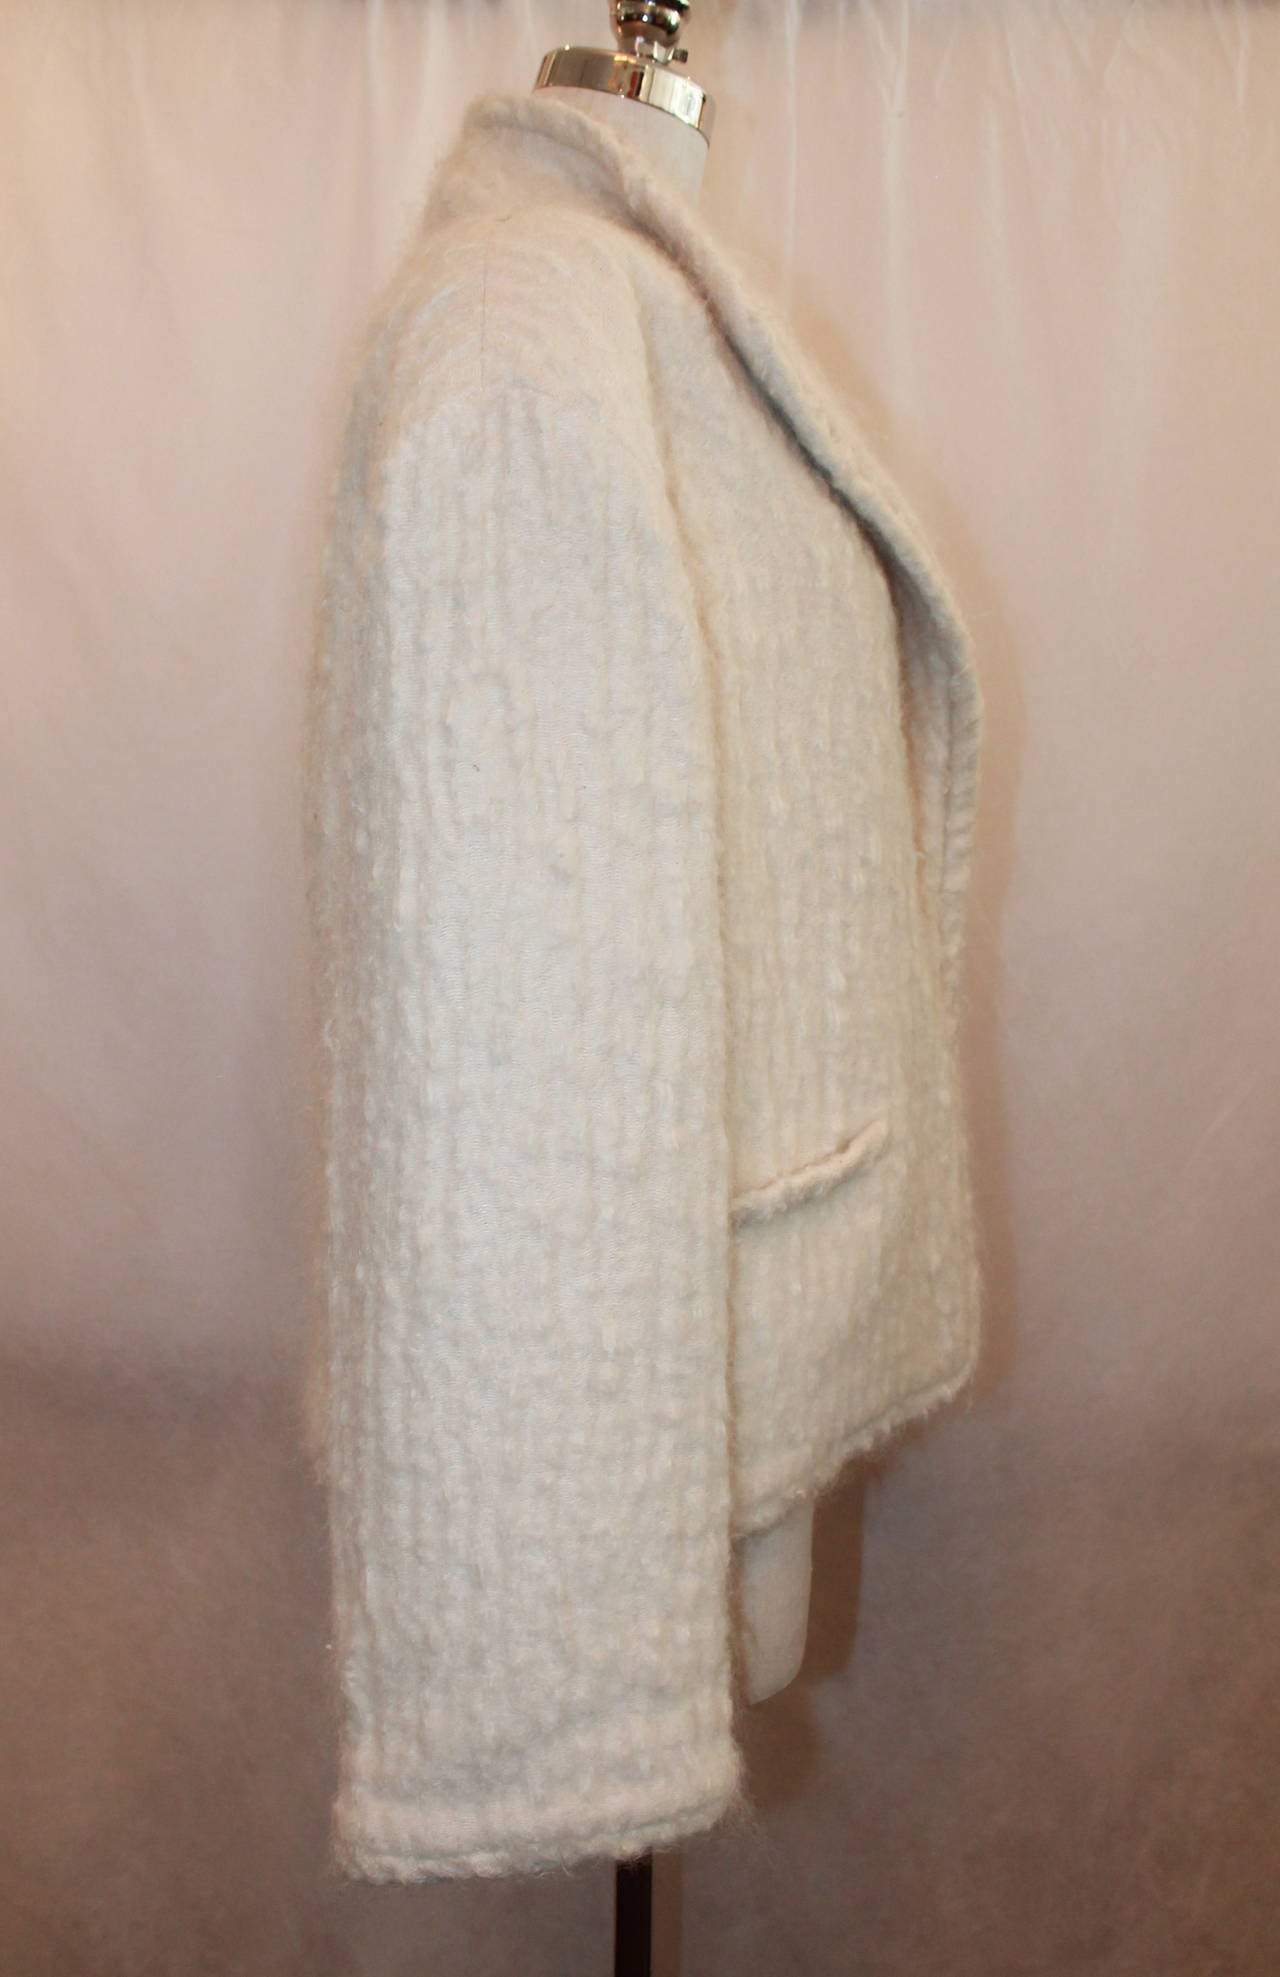 Chanel 1998 Vintage Creme Mohair & Wool Blend Jacket - 38 5